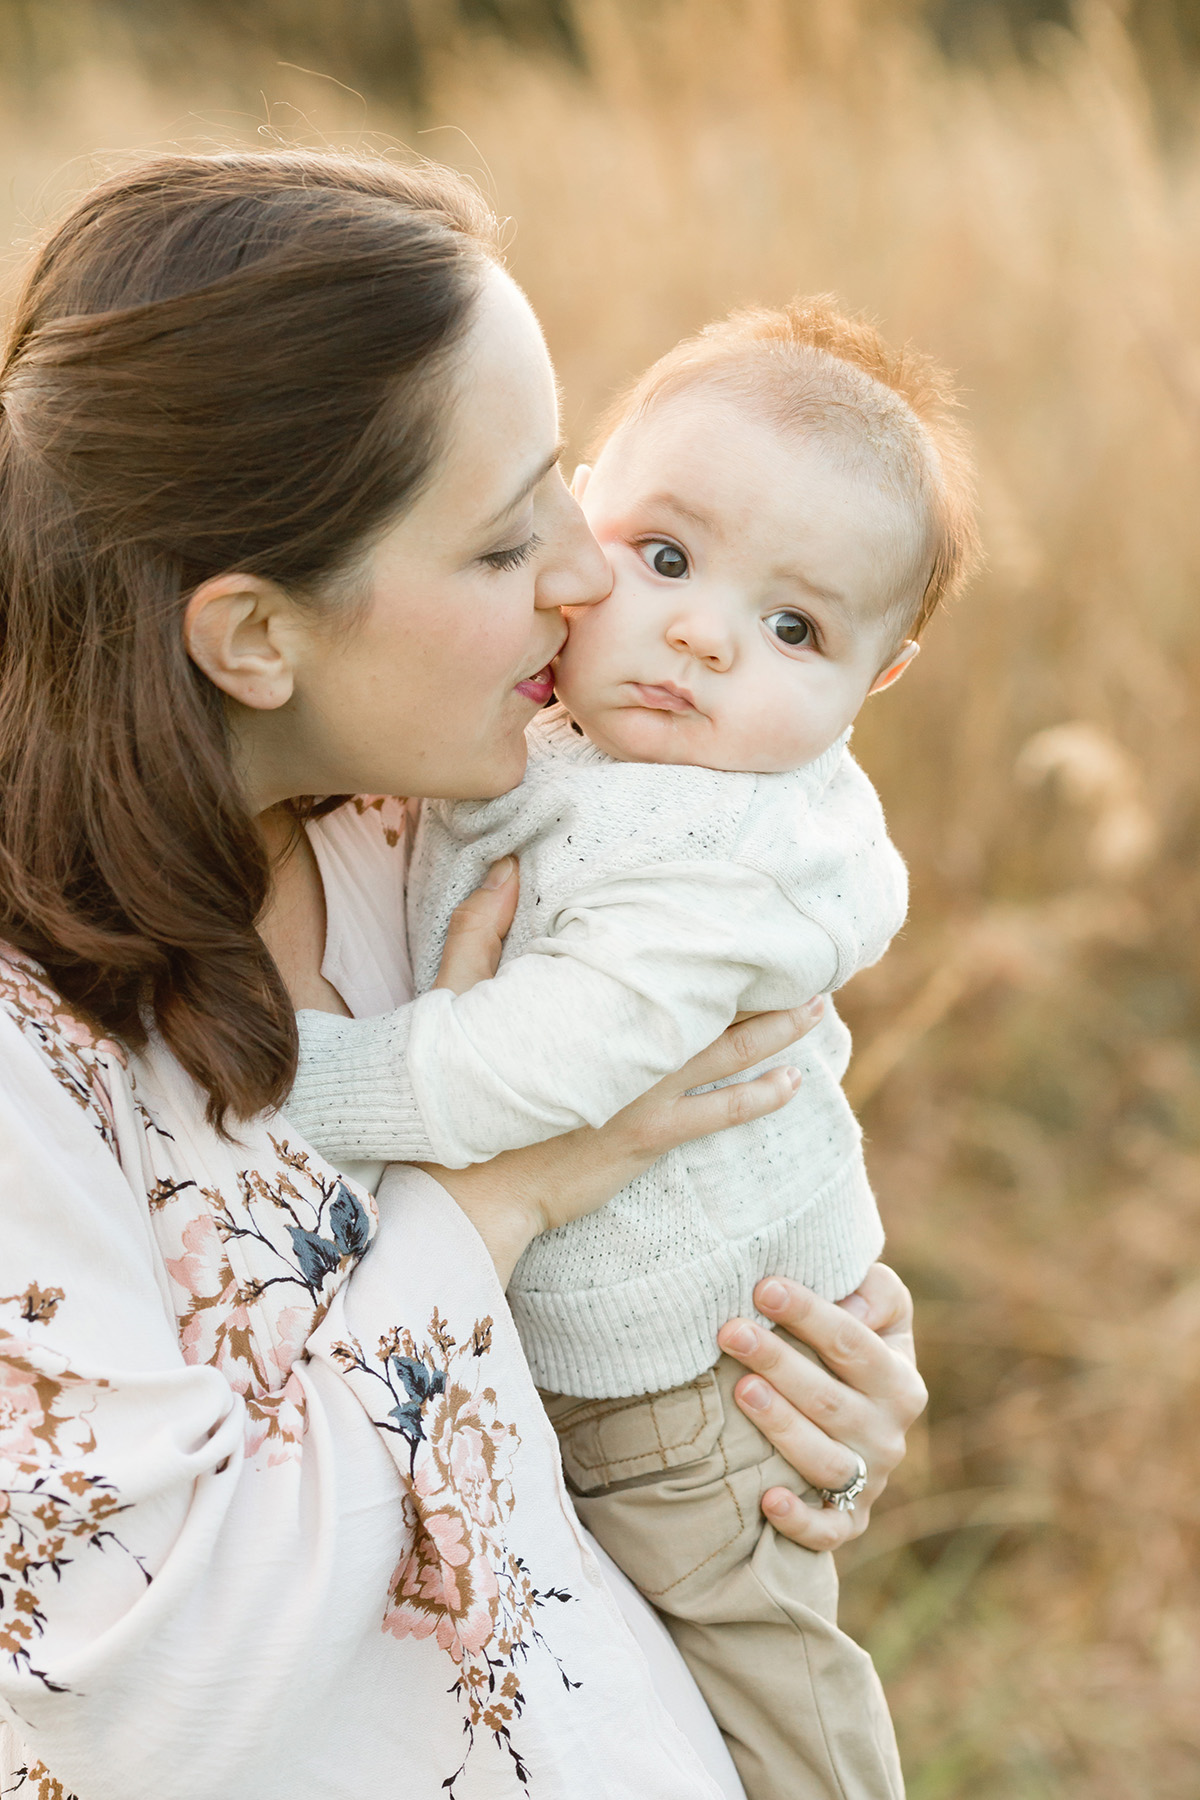 Louisville KY Family Photographer | Baby Photographer | Newborn Photographer | Family Photos Outdoors in Louisville KY.jpg